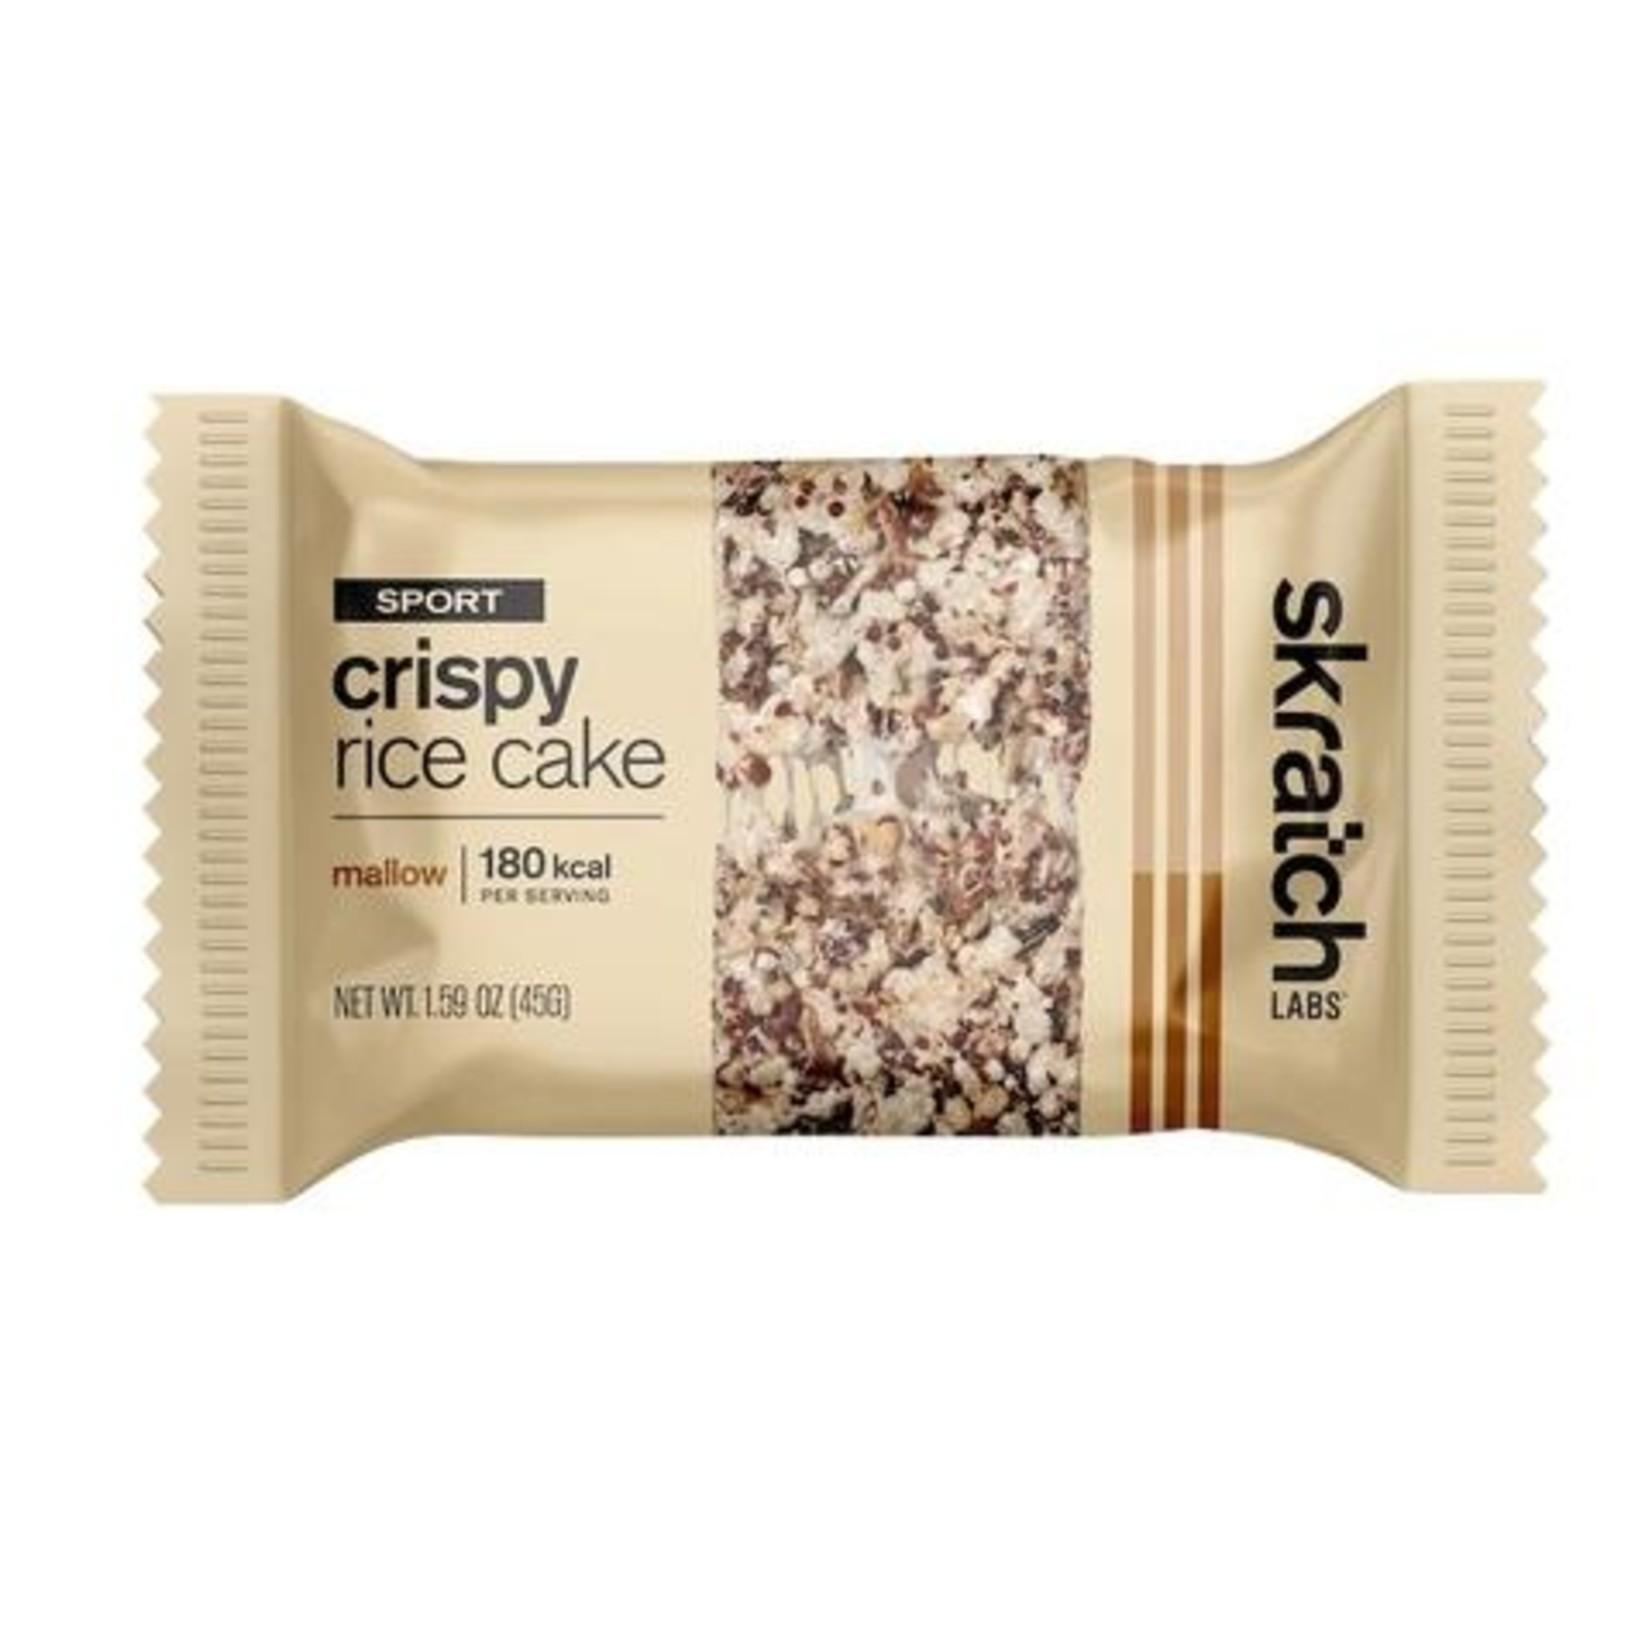 Skratch Labs Skratch Crispy Rice Cake 45g